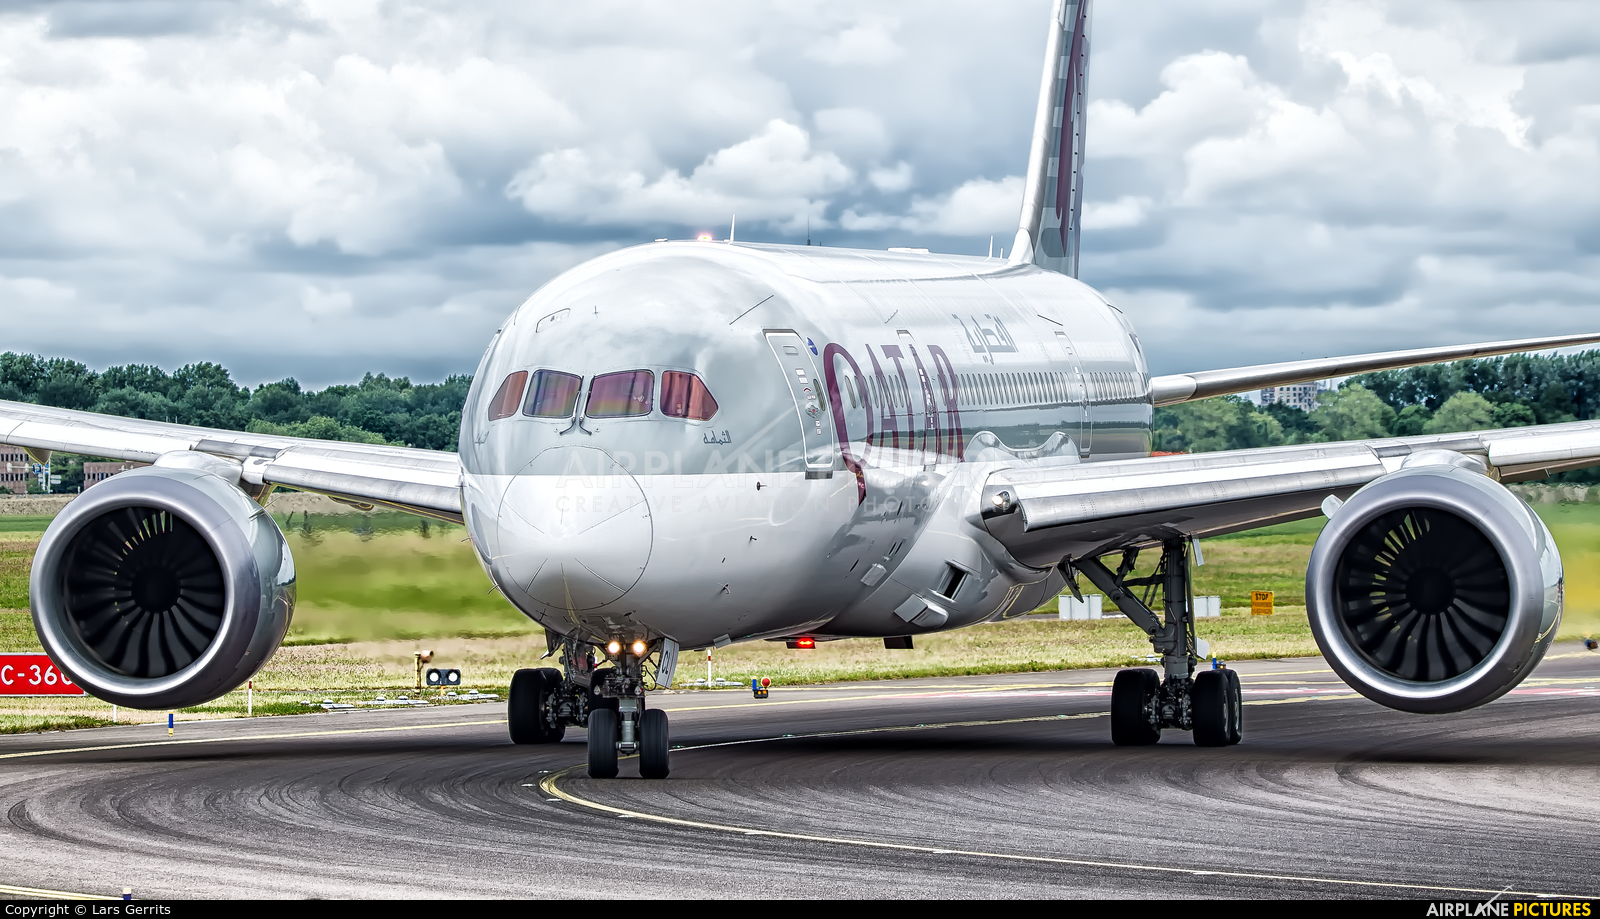 Qatar Airways A7-BCL aircraft at Amsterdam - Schiphol